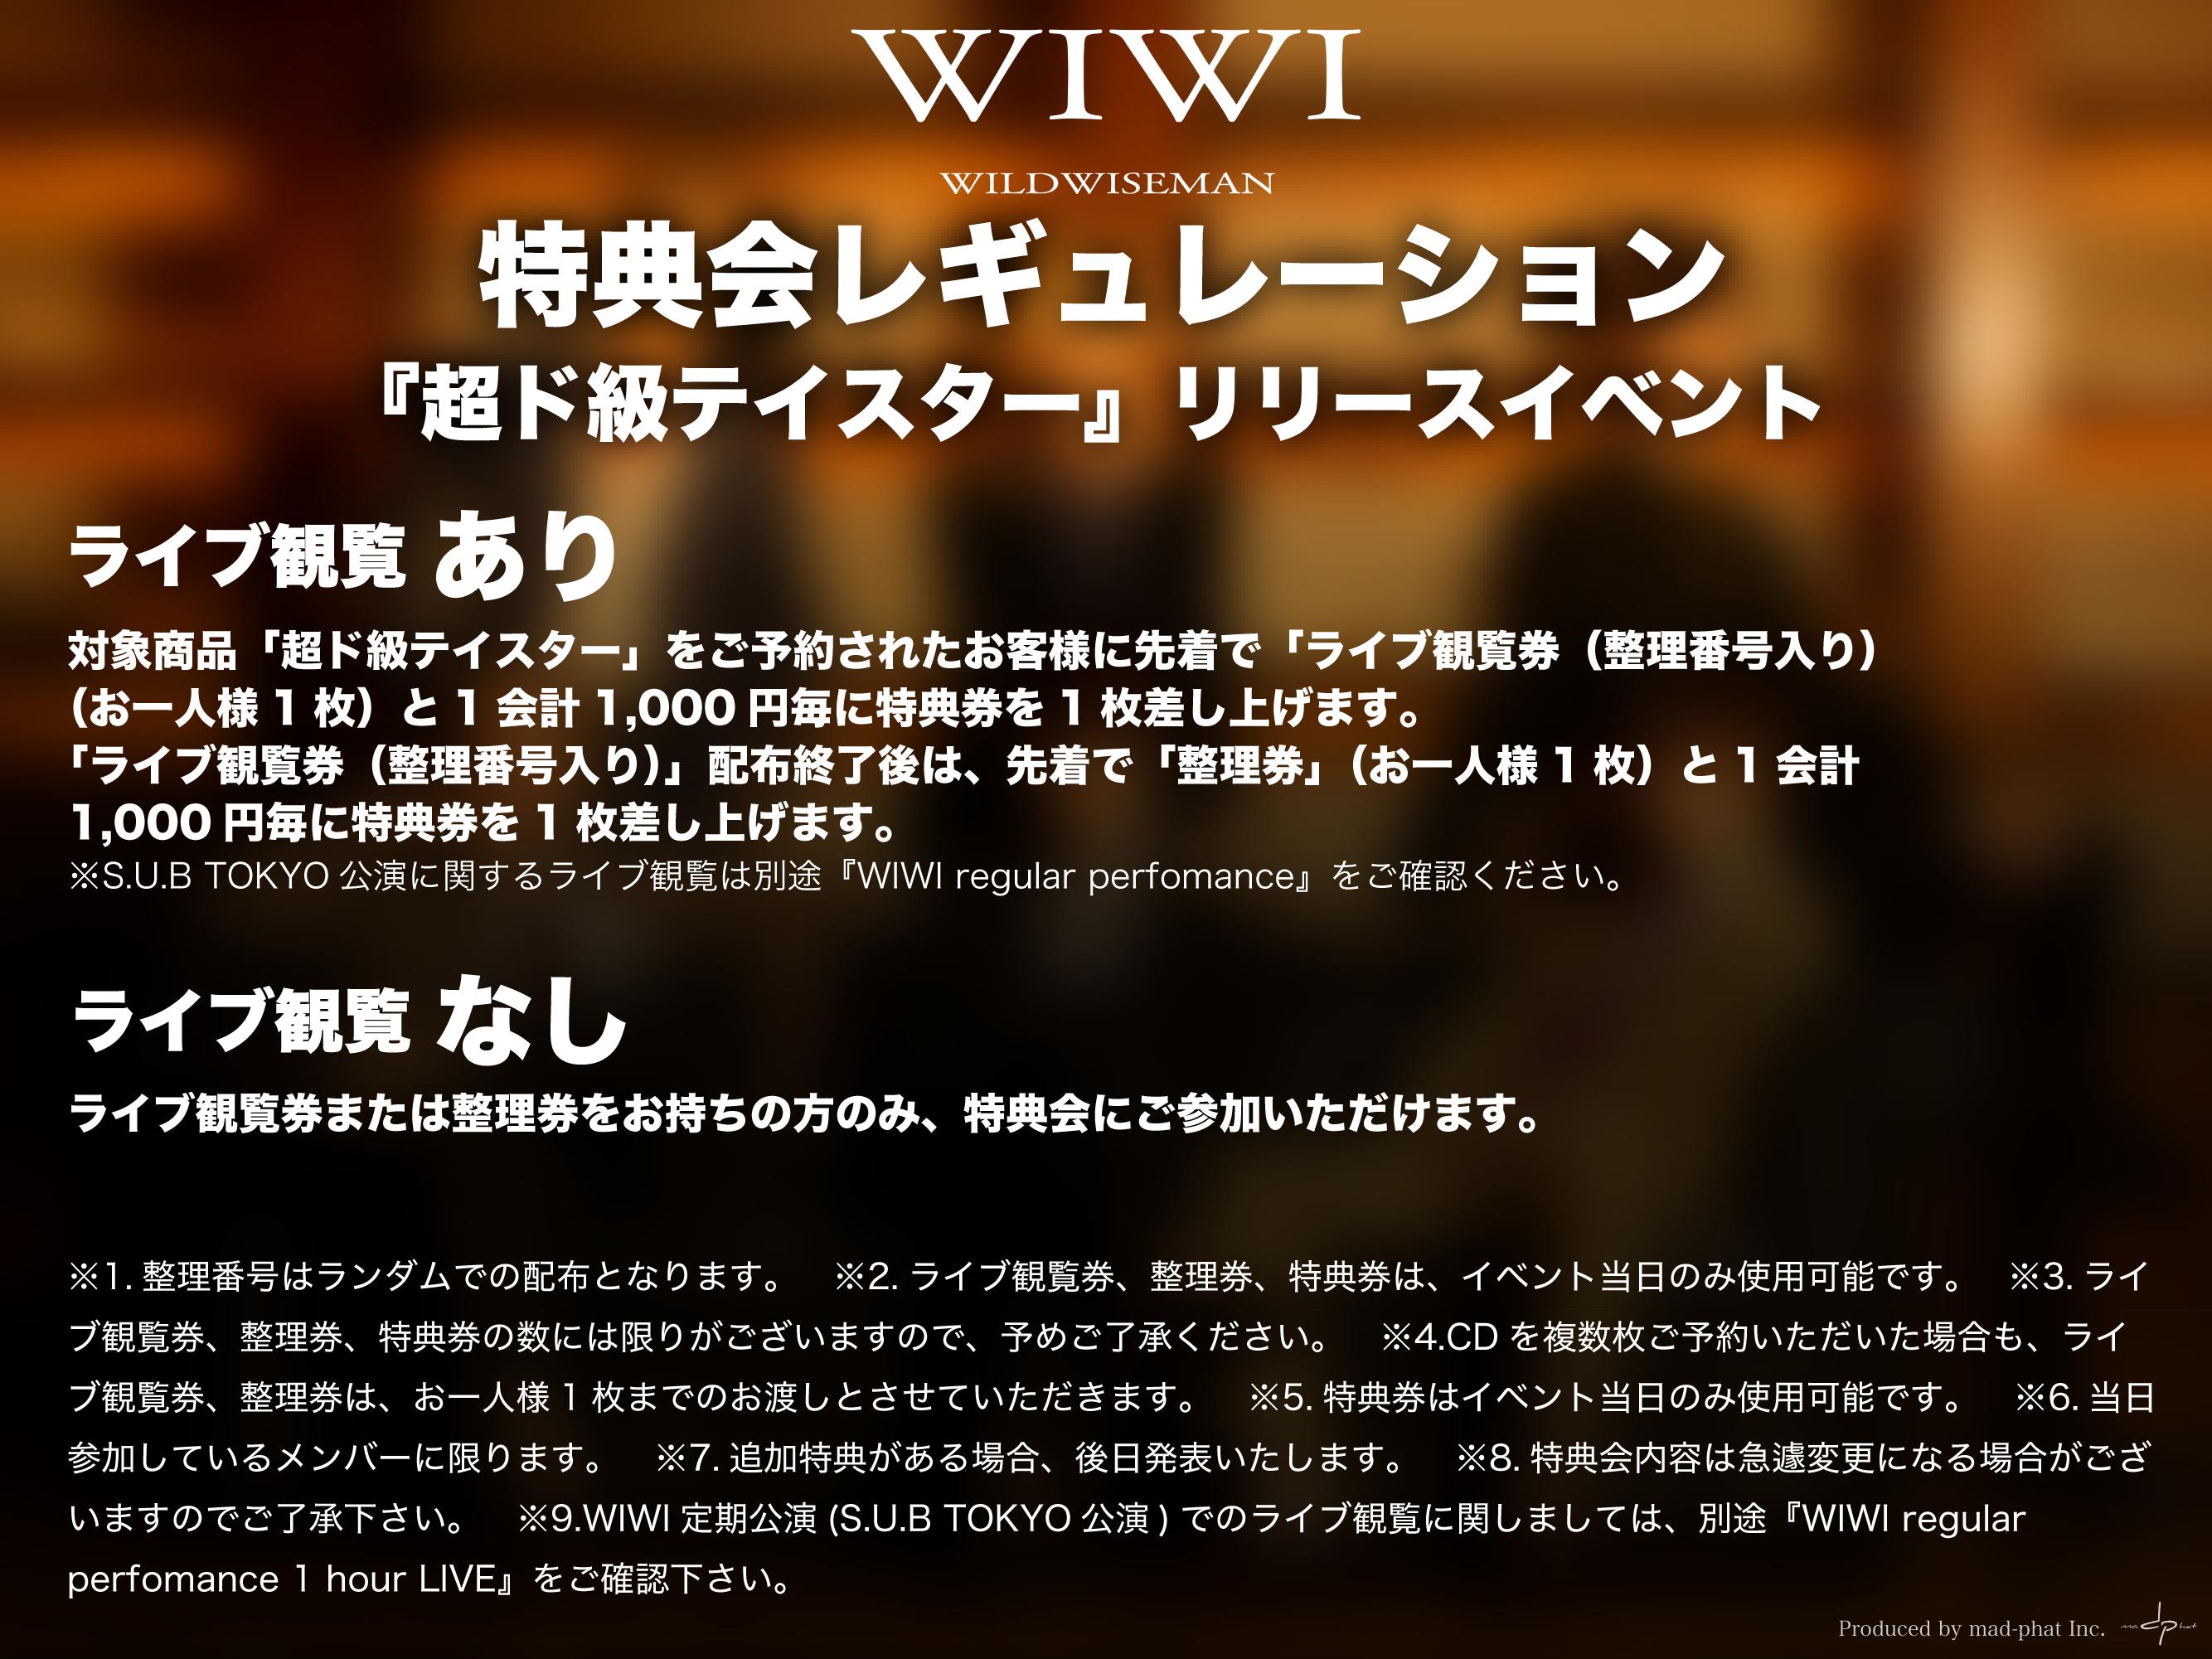 WIWI 1st Single 02